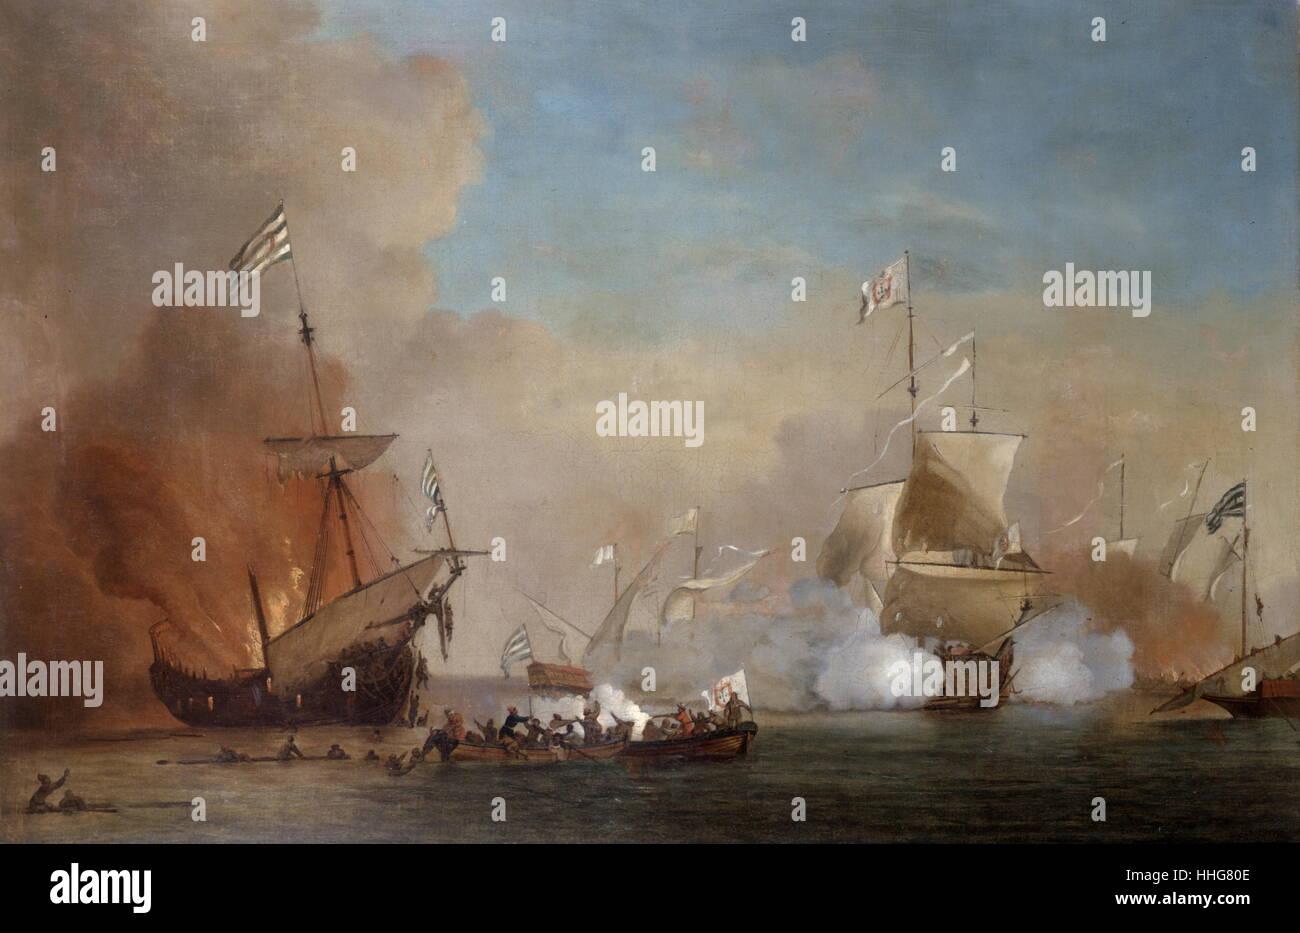 School of William Van der Velde 1663-1707. Pirates attack an English Warship. Oil on Canvas - Stock Image